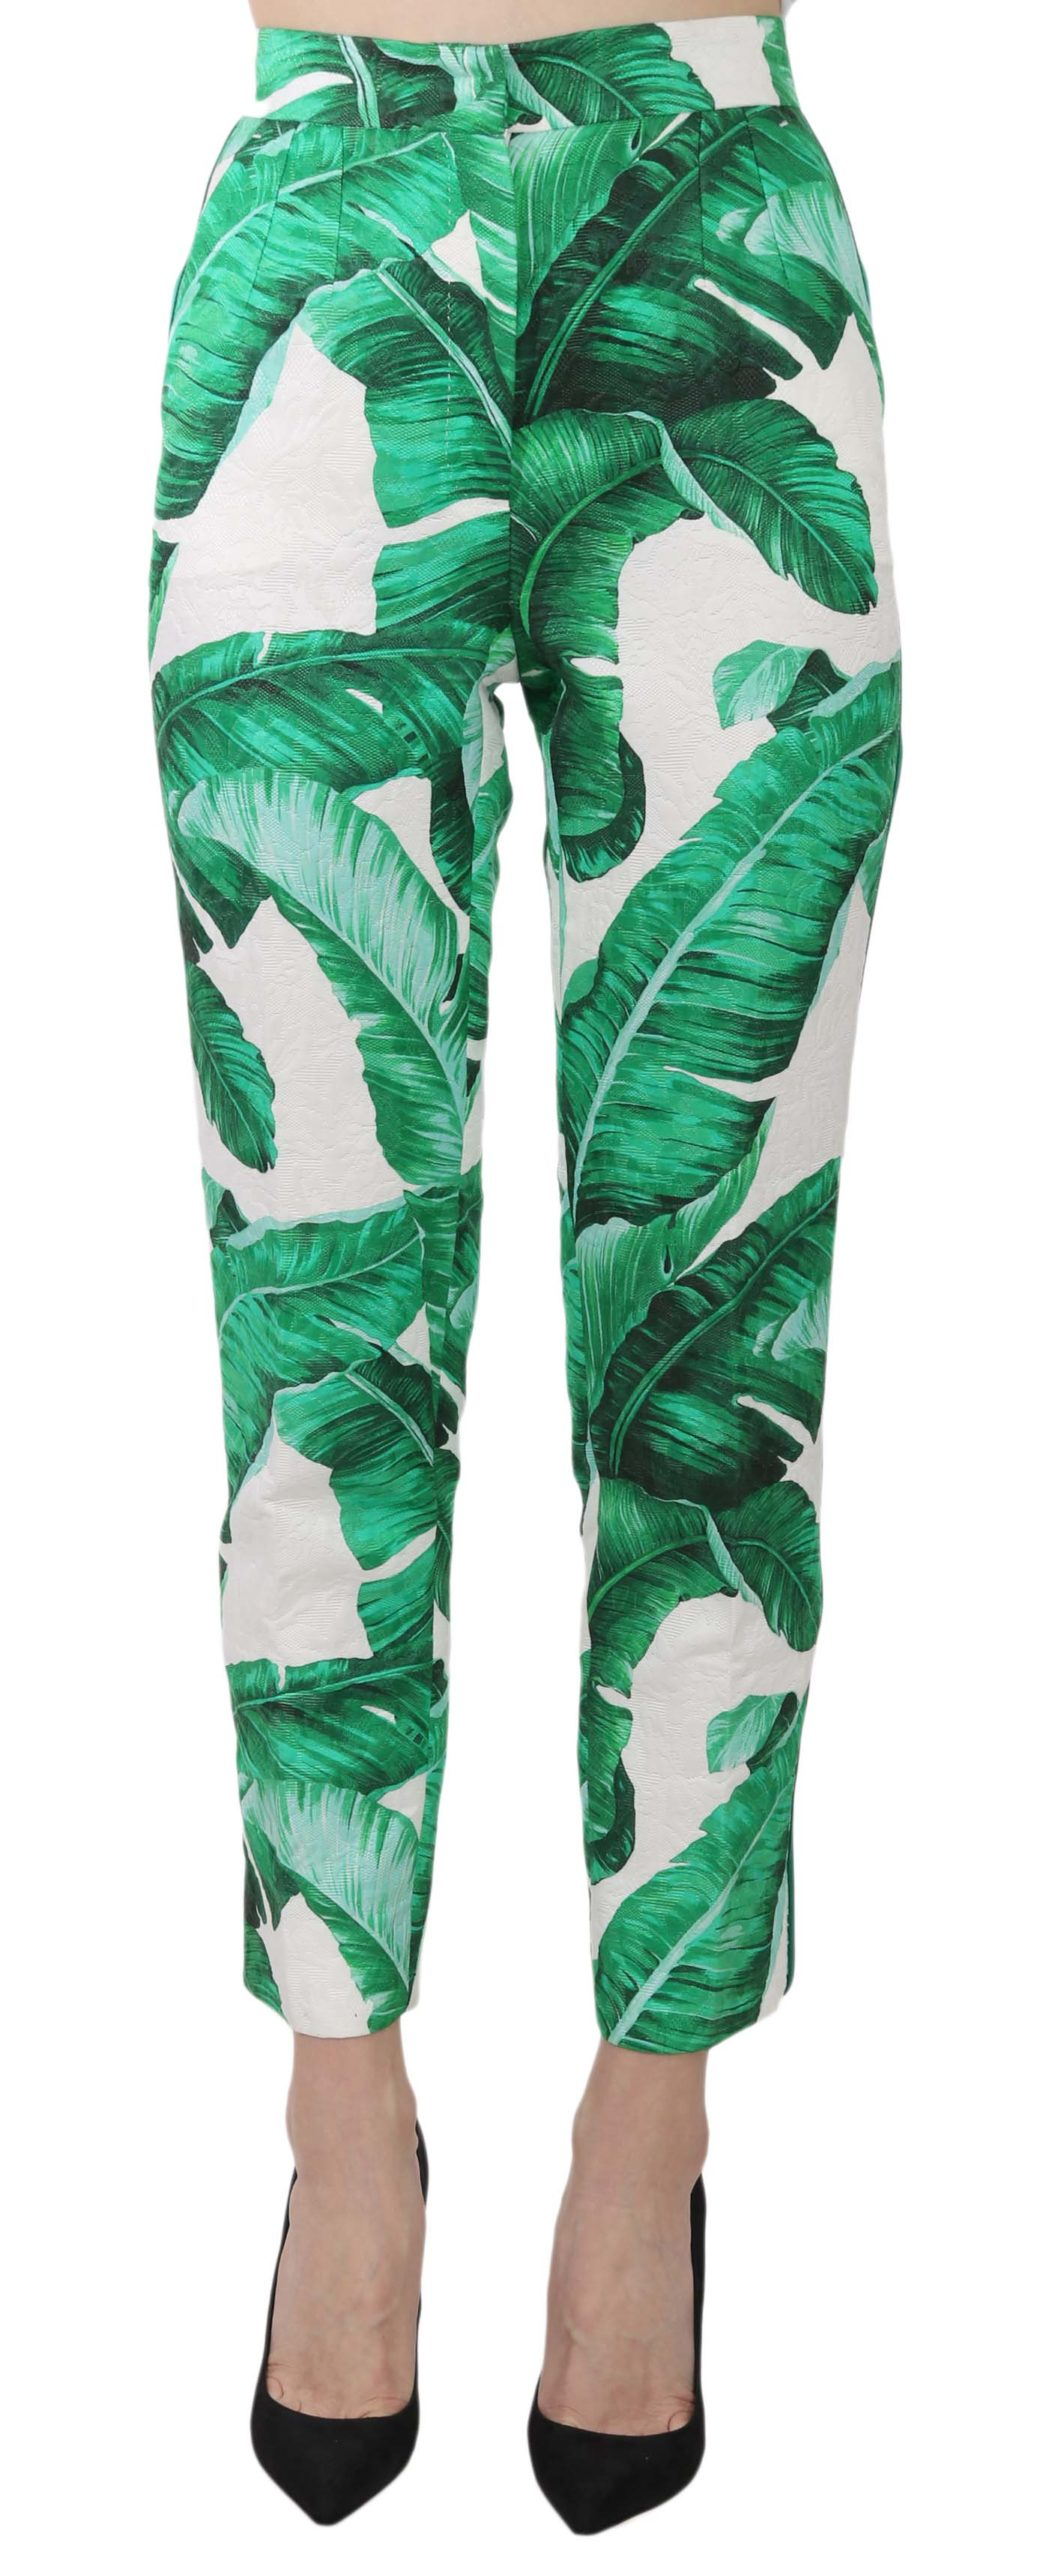 Dolce & Gabbana Women Banana Leaf Print Jaquard Trouser Slim Pants Green PAN61207 - IT38|XS